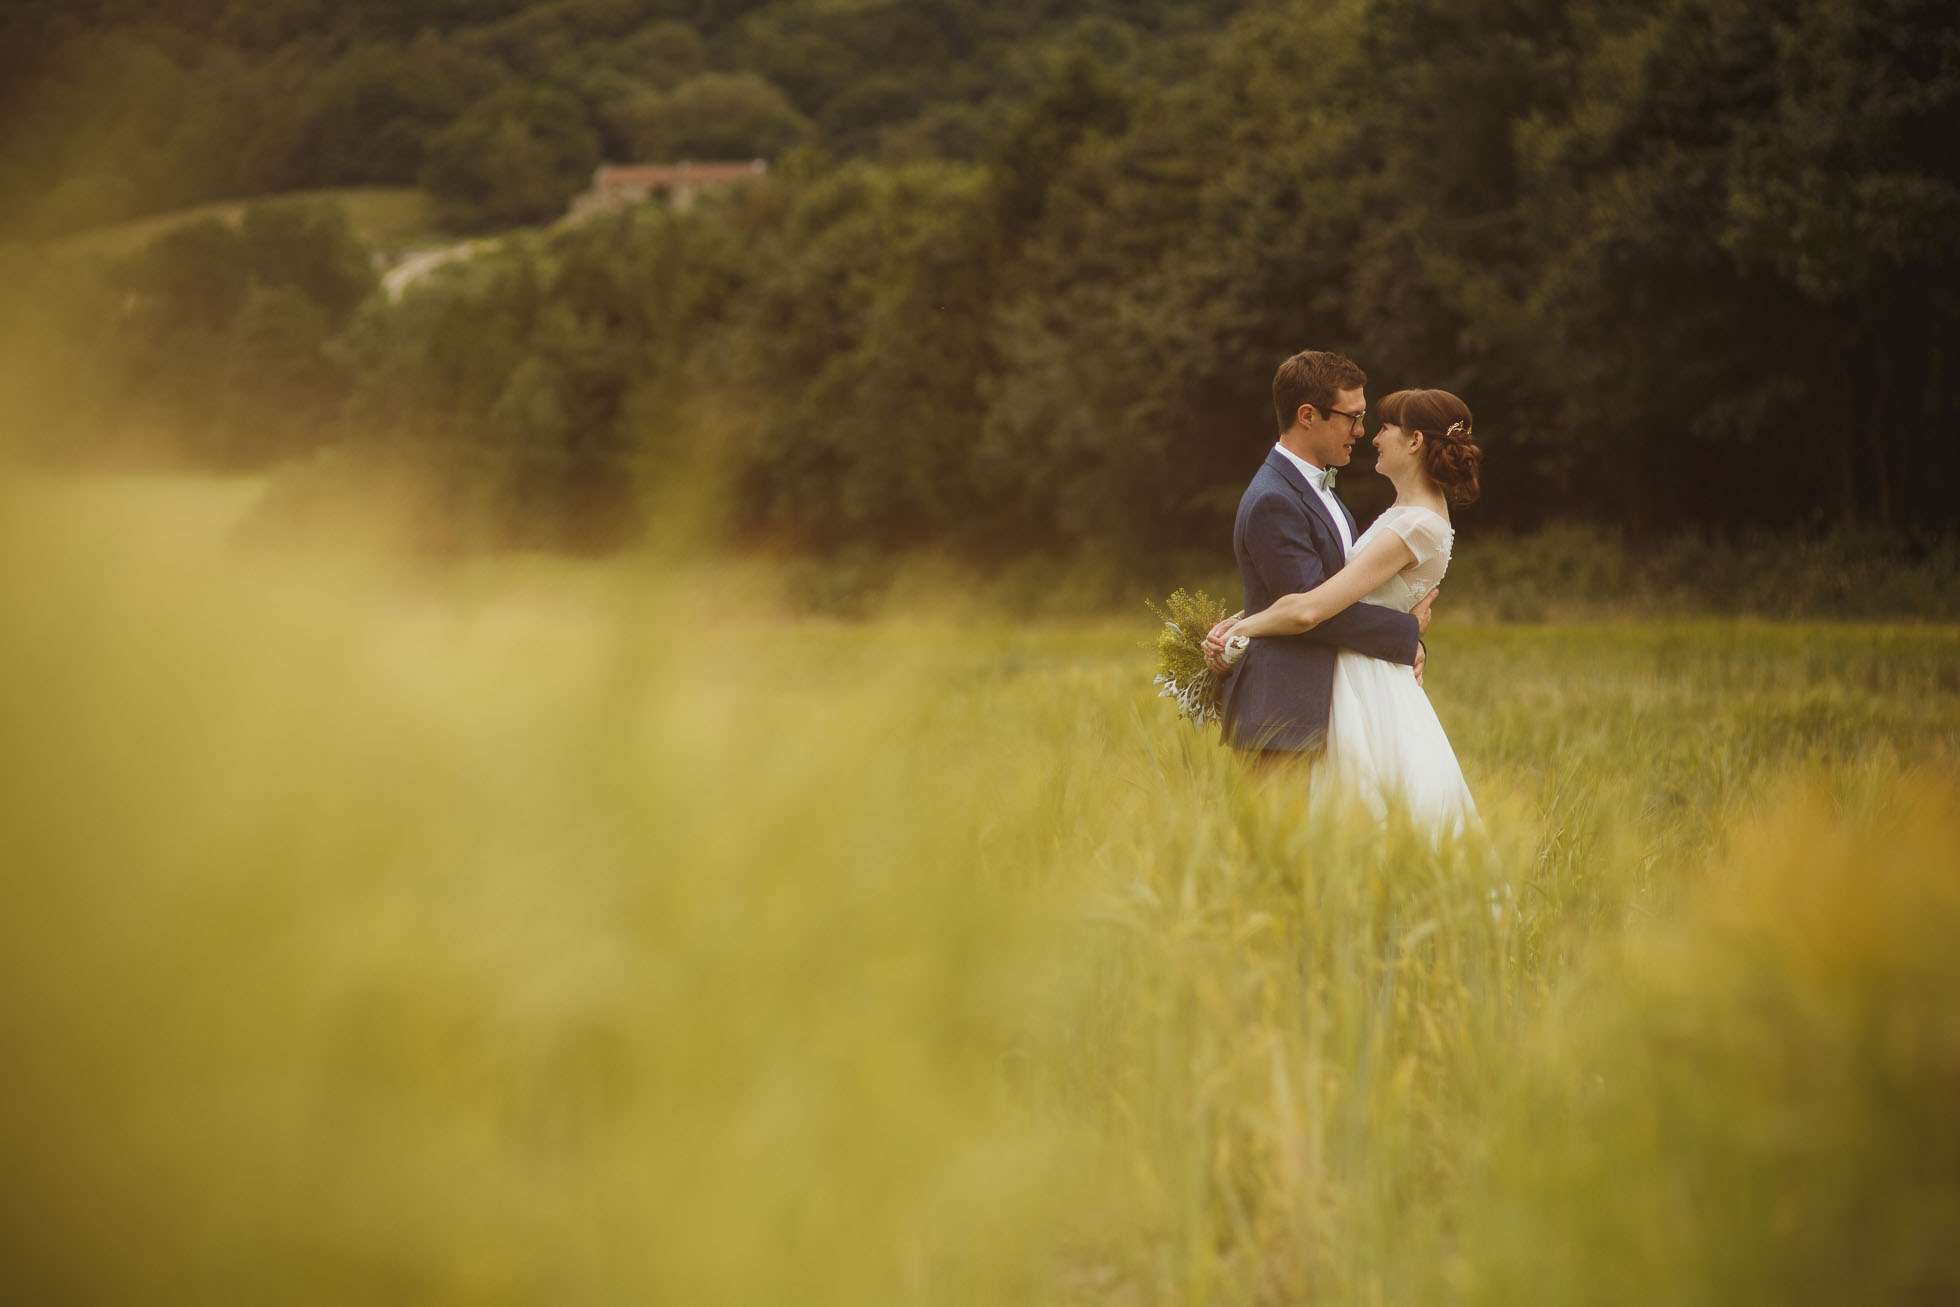 hackness wedding photographer-75.jpg